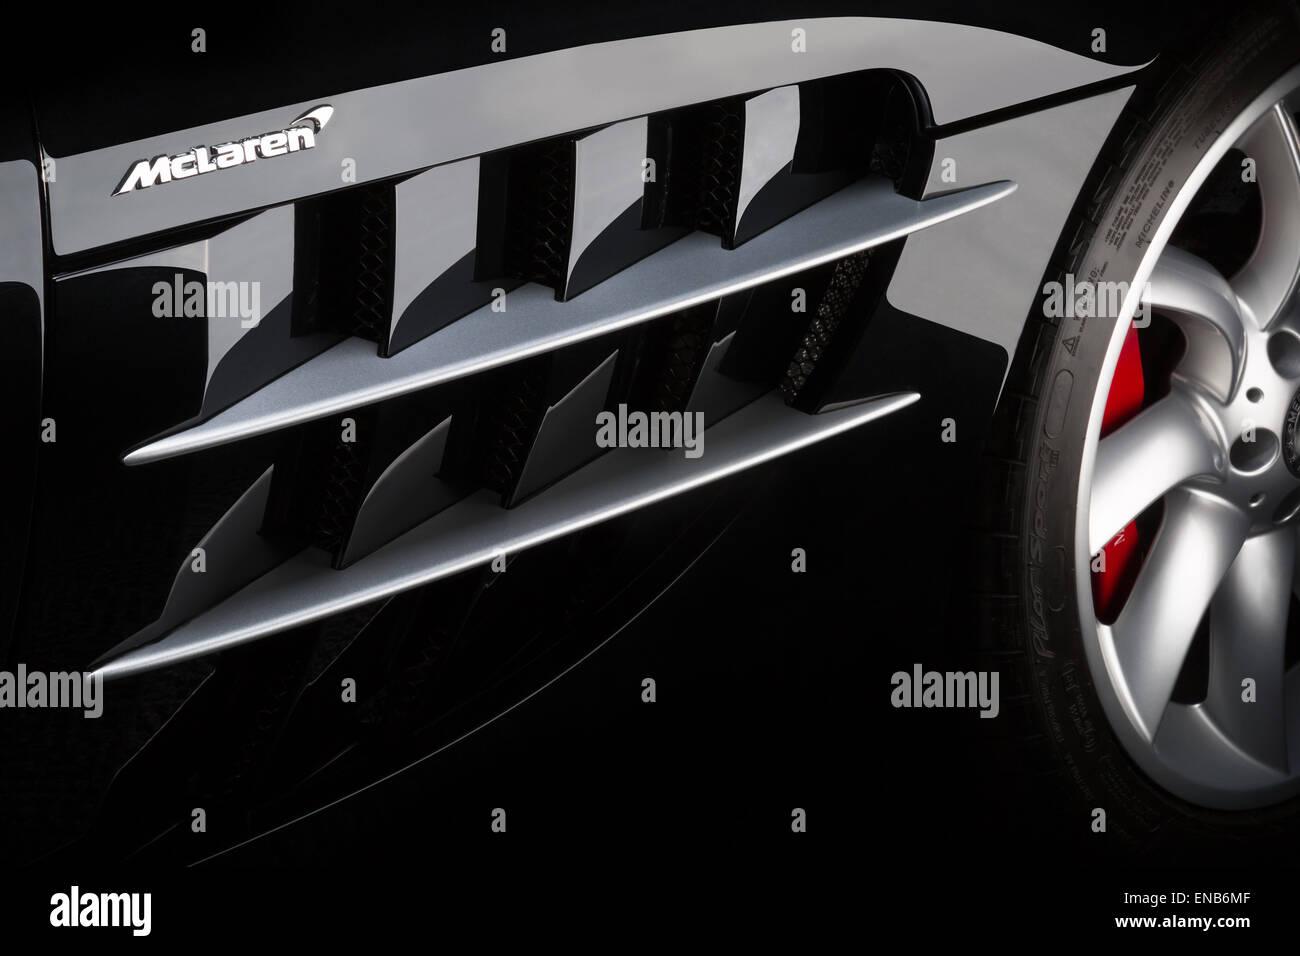 McLaren SLR in black, classical detail shot of side vent details. - Stock Image